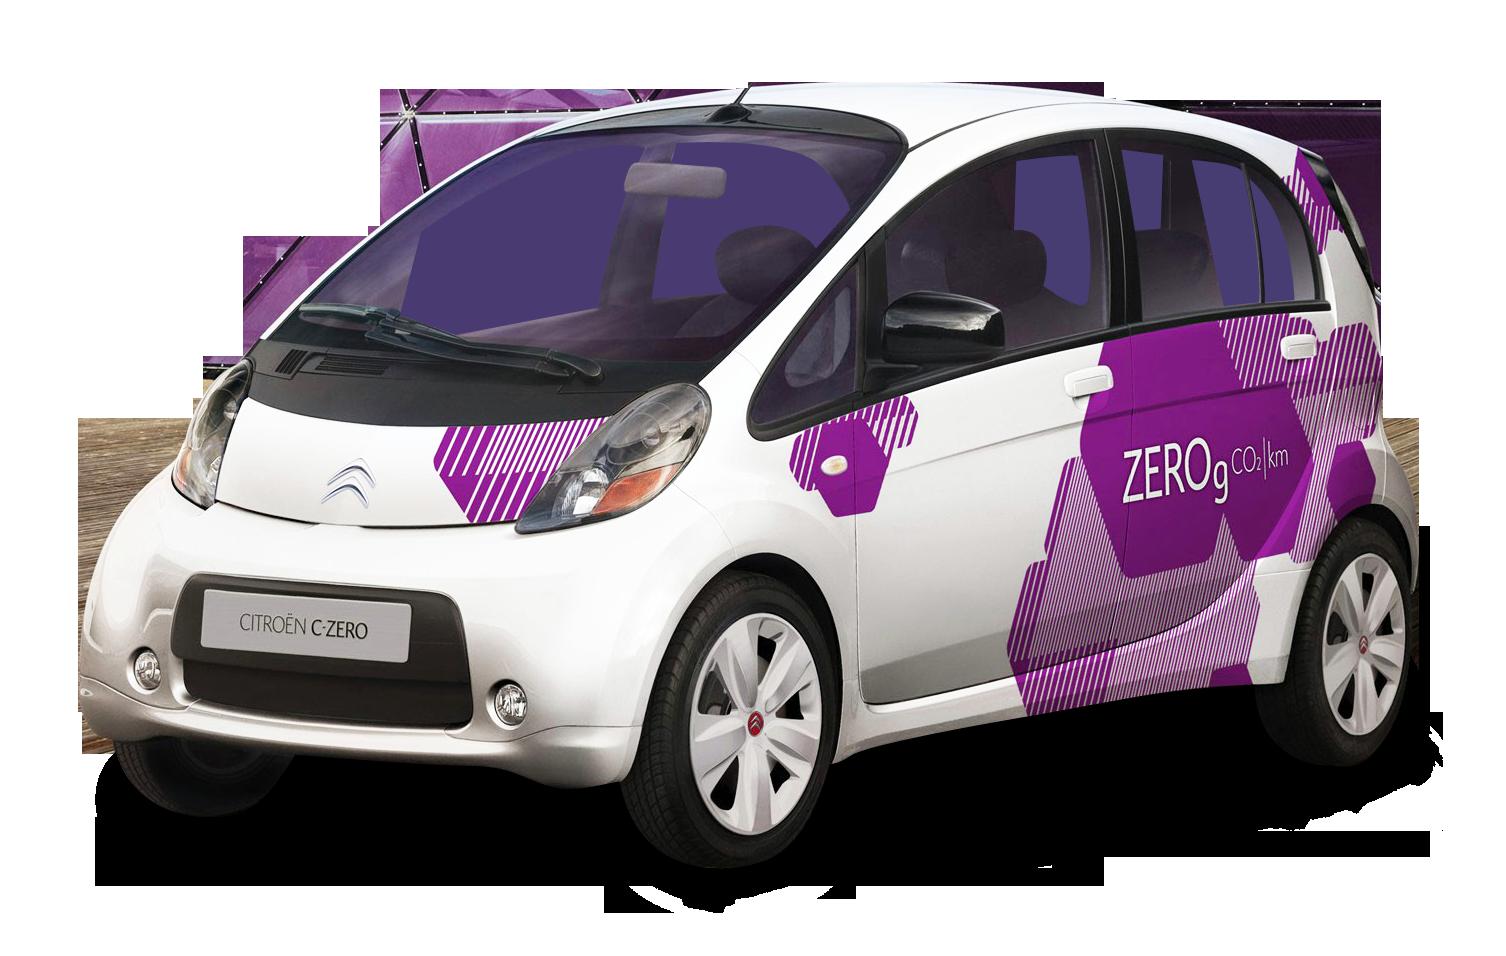 white citroen c zero small car png image purepng free